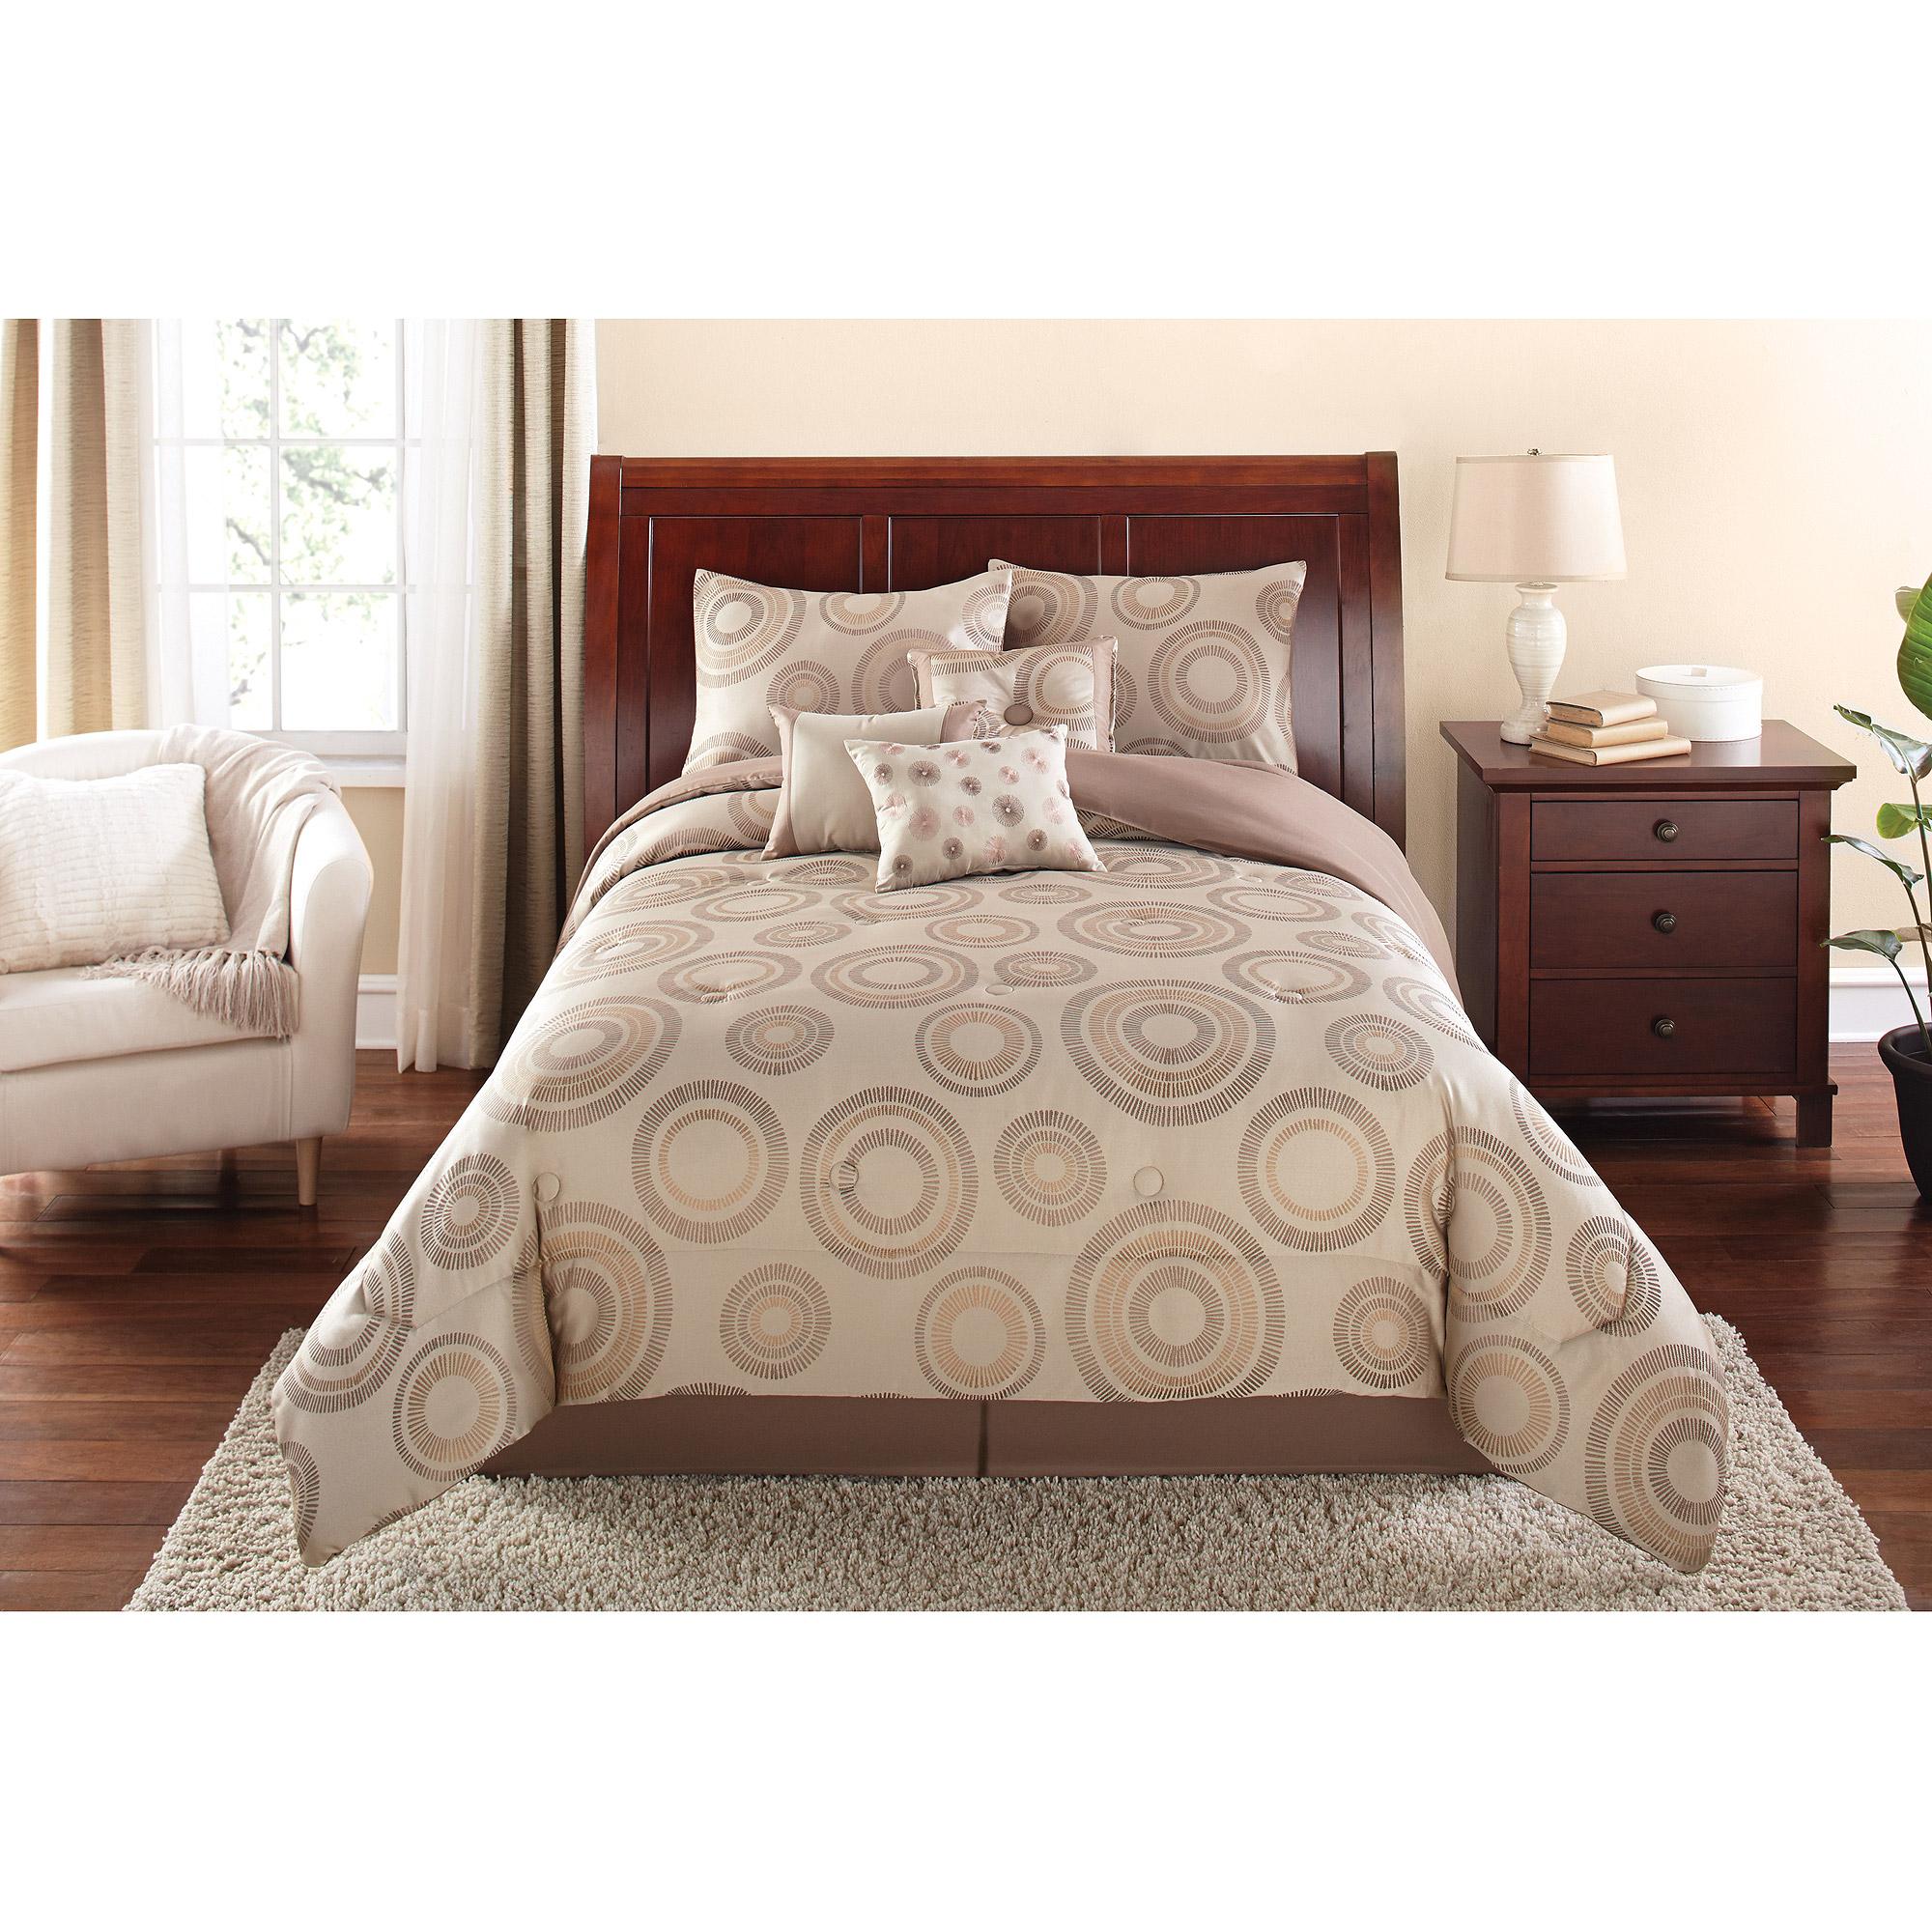 Mainstays 7-Piece Global Circle Bedding Comforter Set